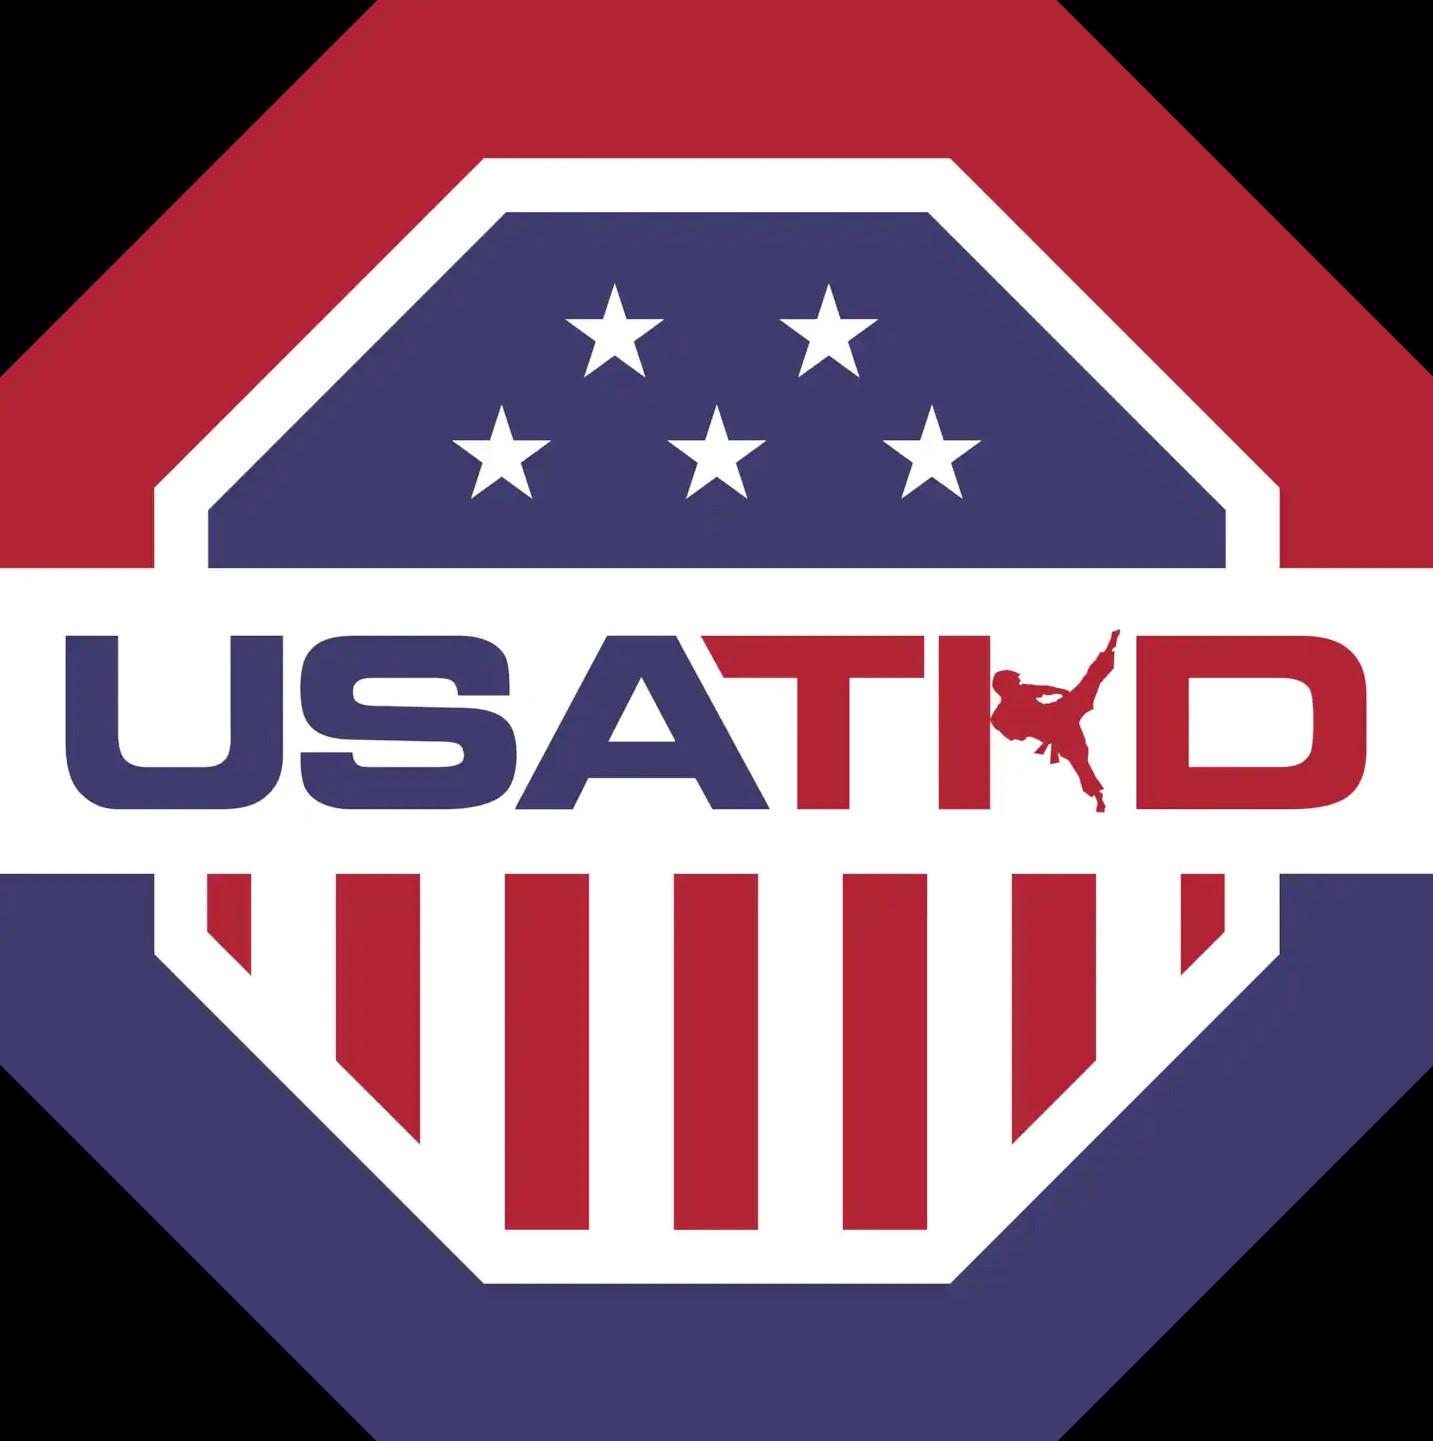 Registration open for inaugural USA Taekwondo Grand Prix Series